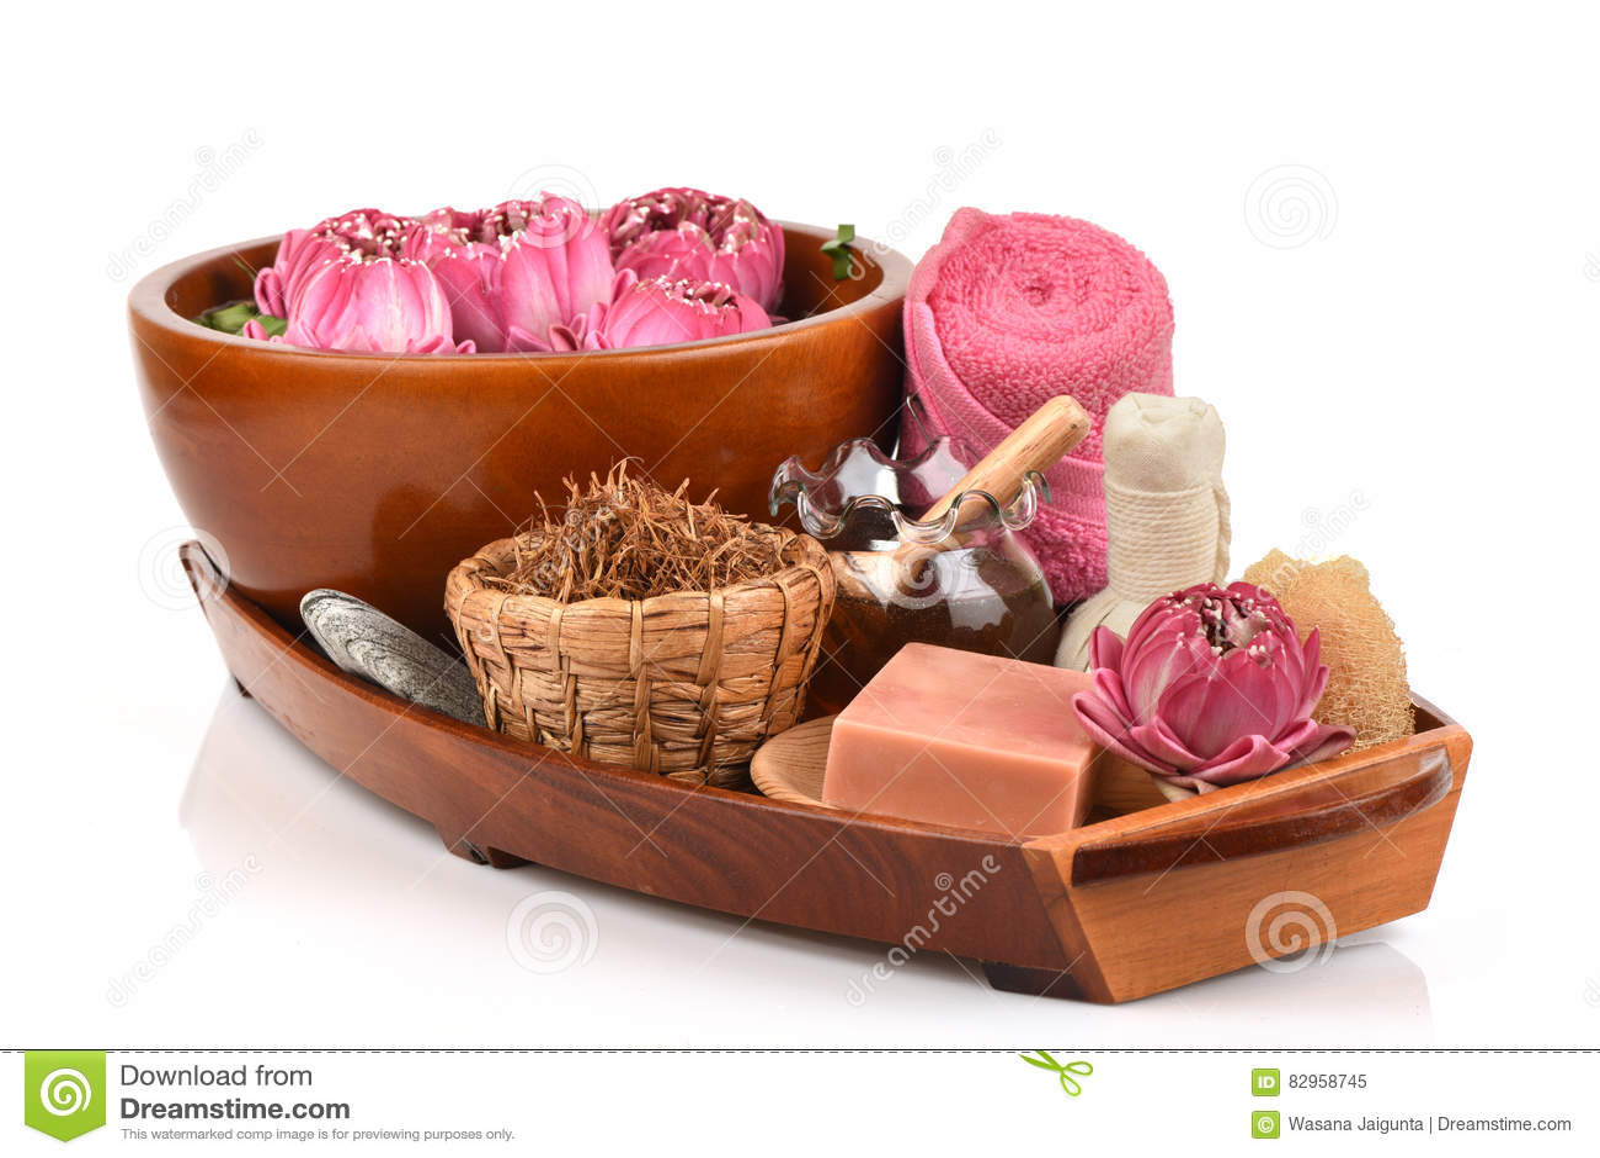 Pollen Lotus Lotus Flower And Soap Handmade Soaps Spa Flower Of